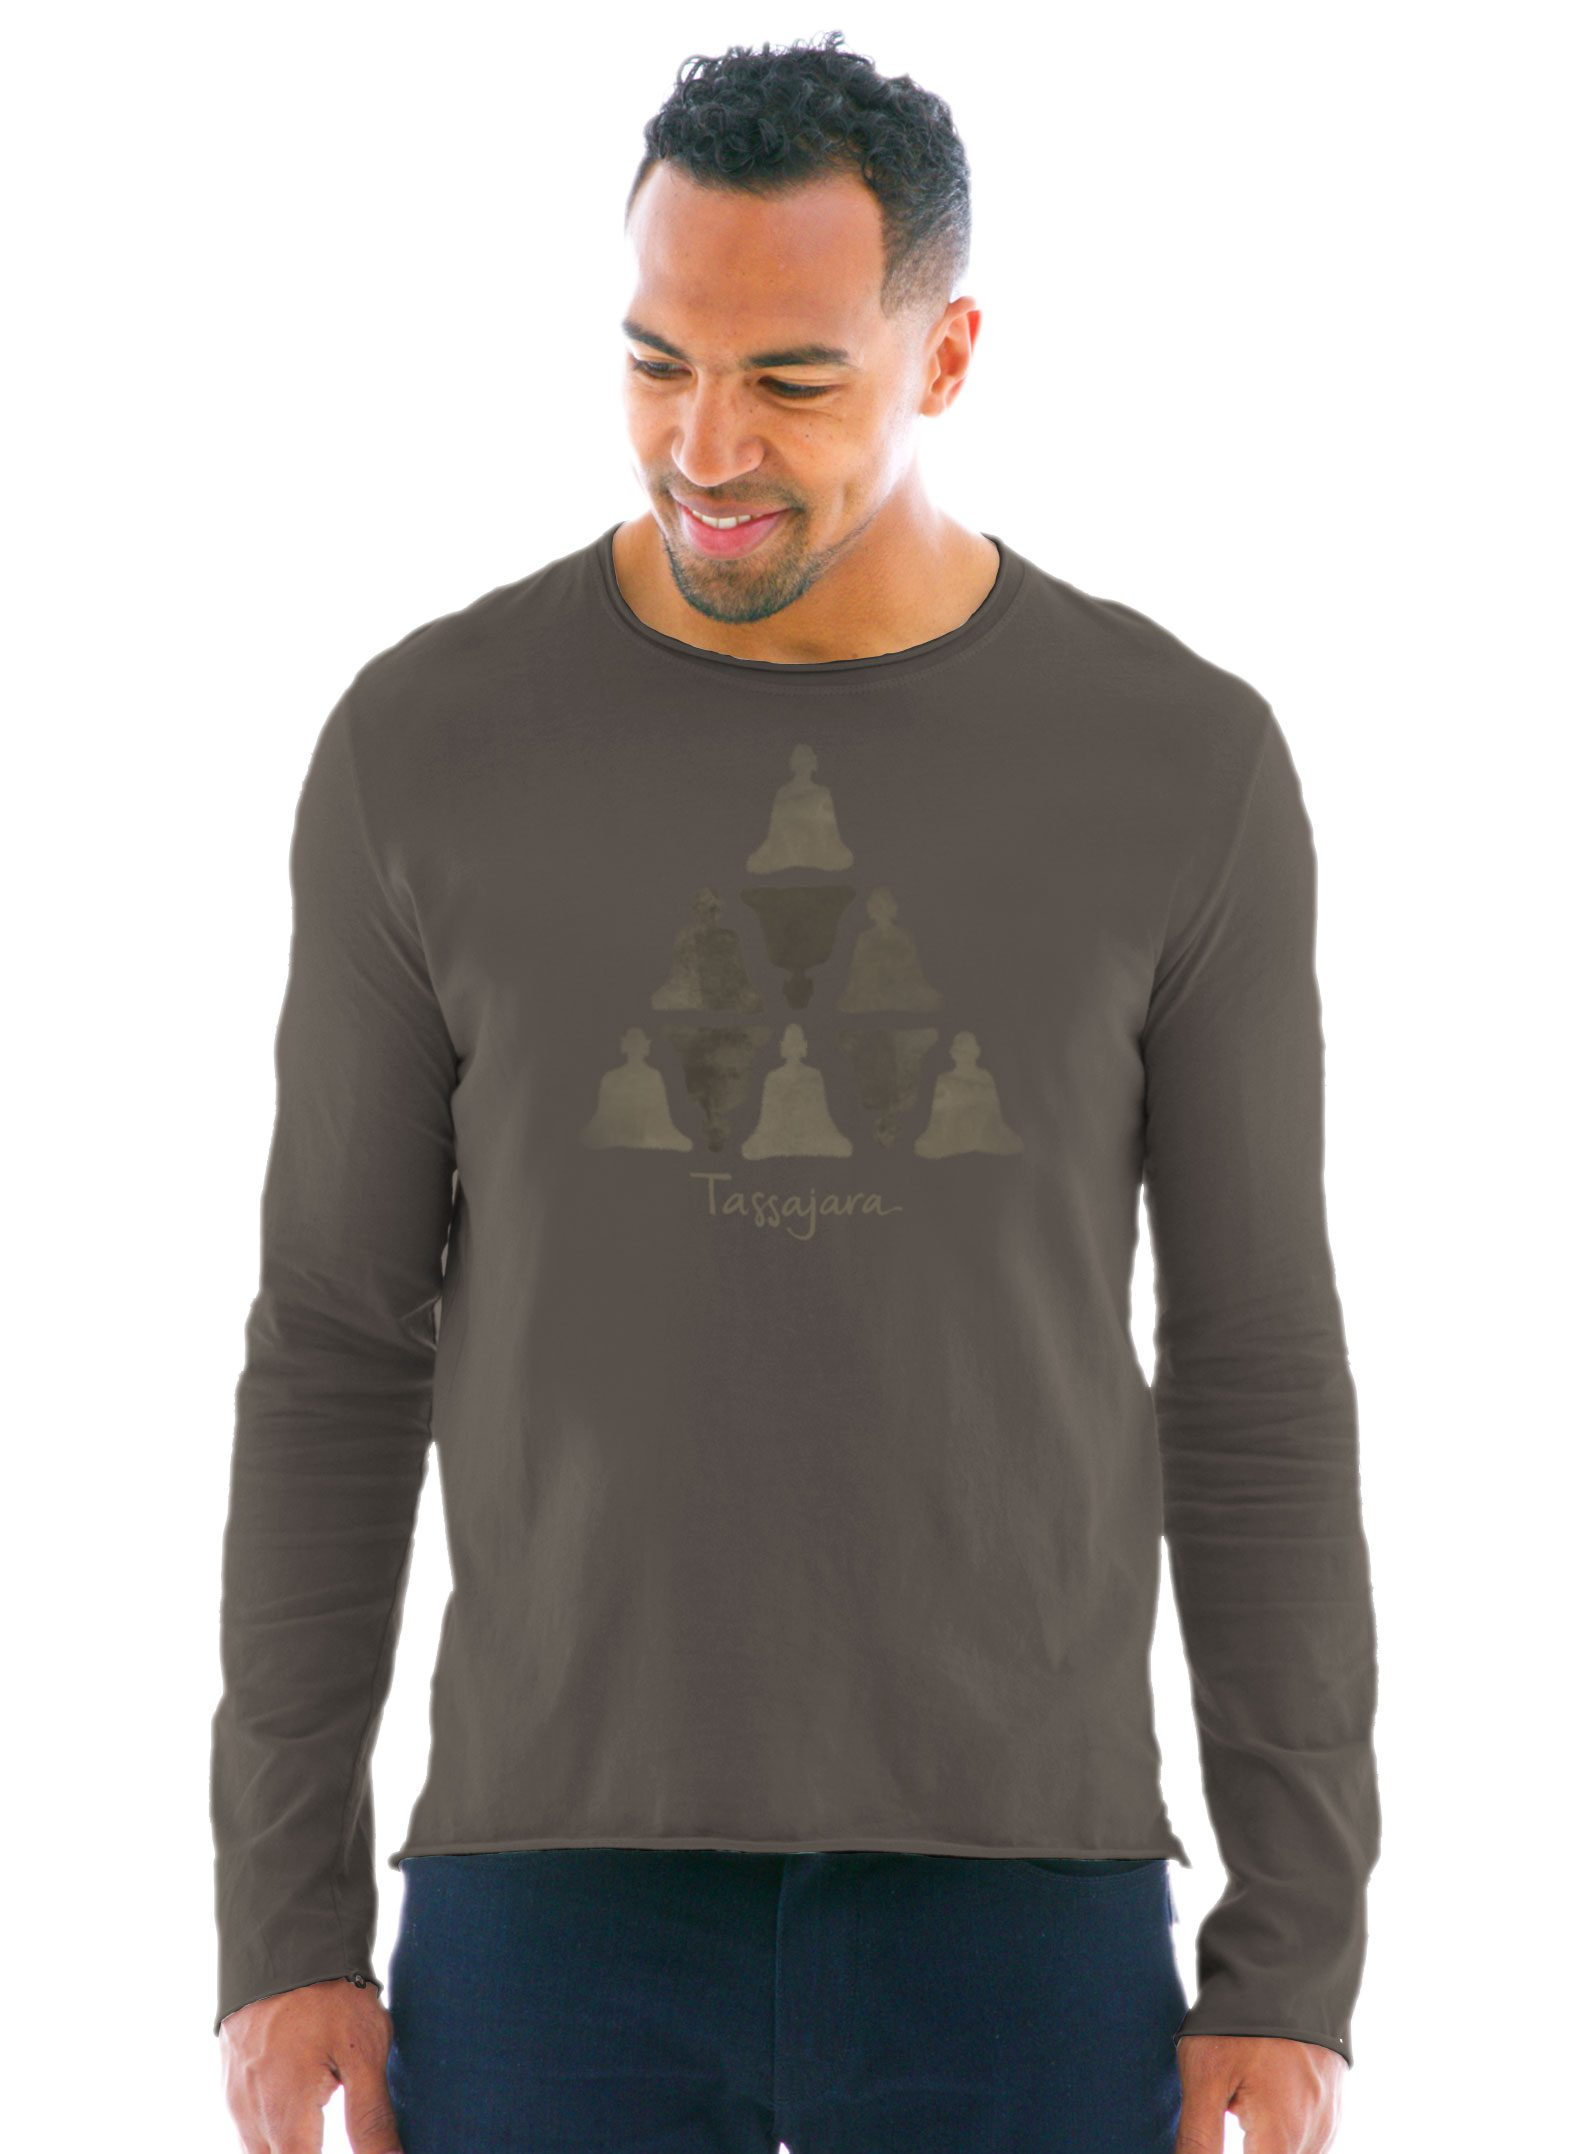 Men's Raw Edge Long Sleeve Crew T-Shirt